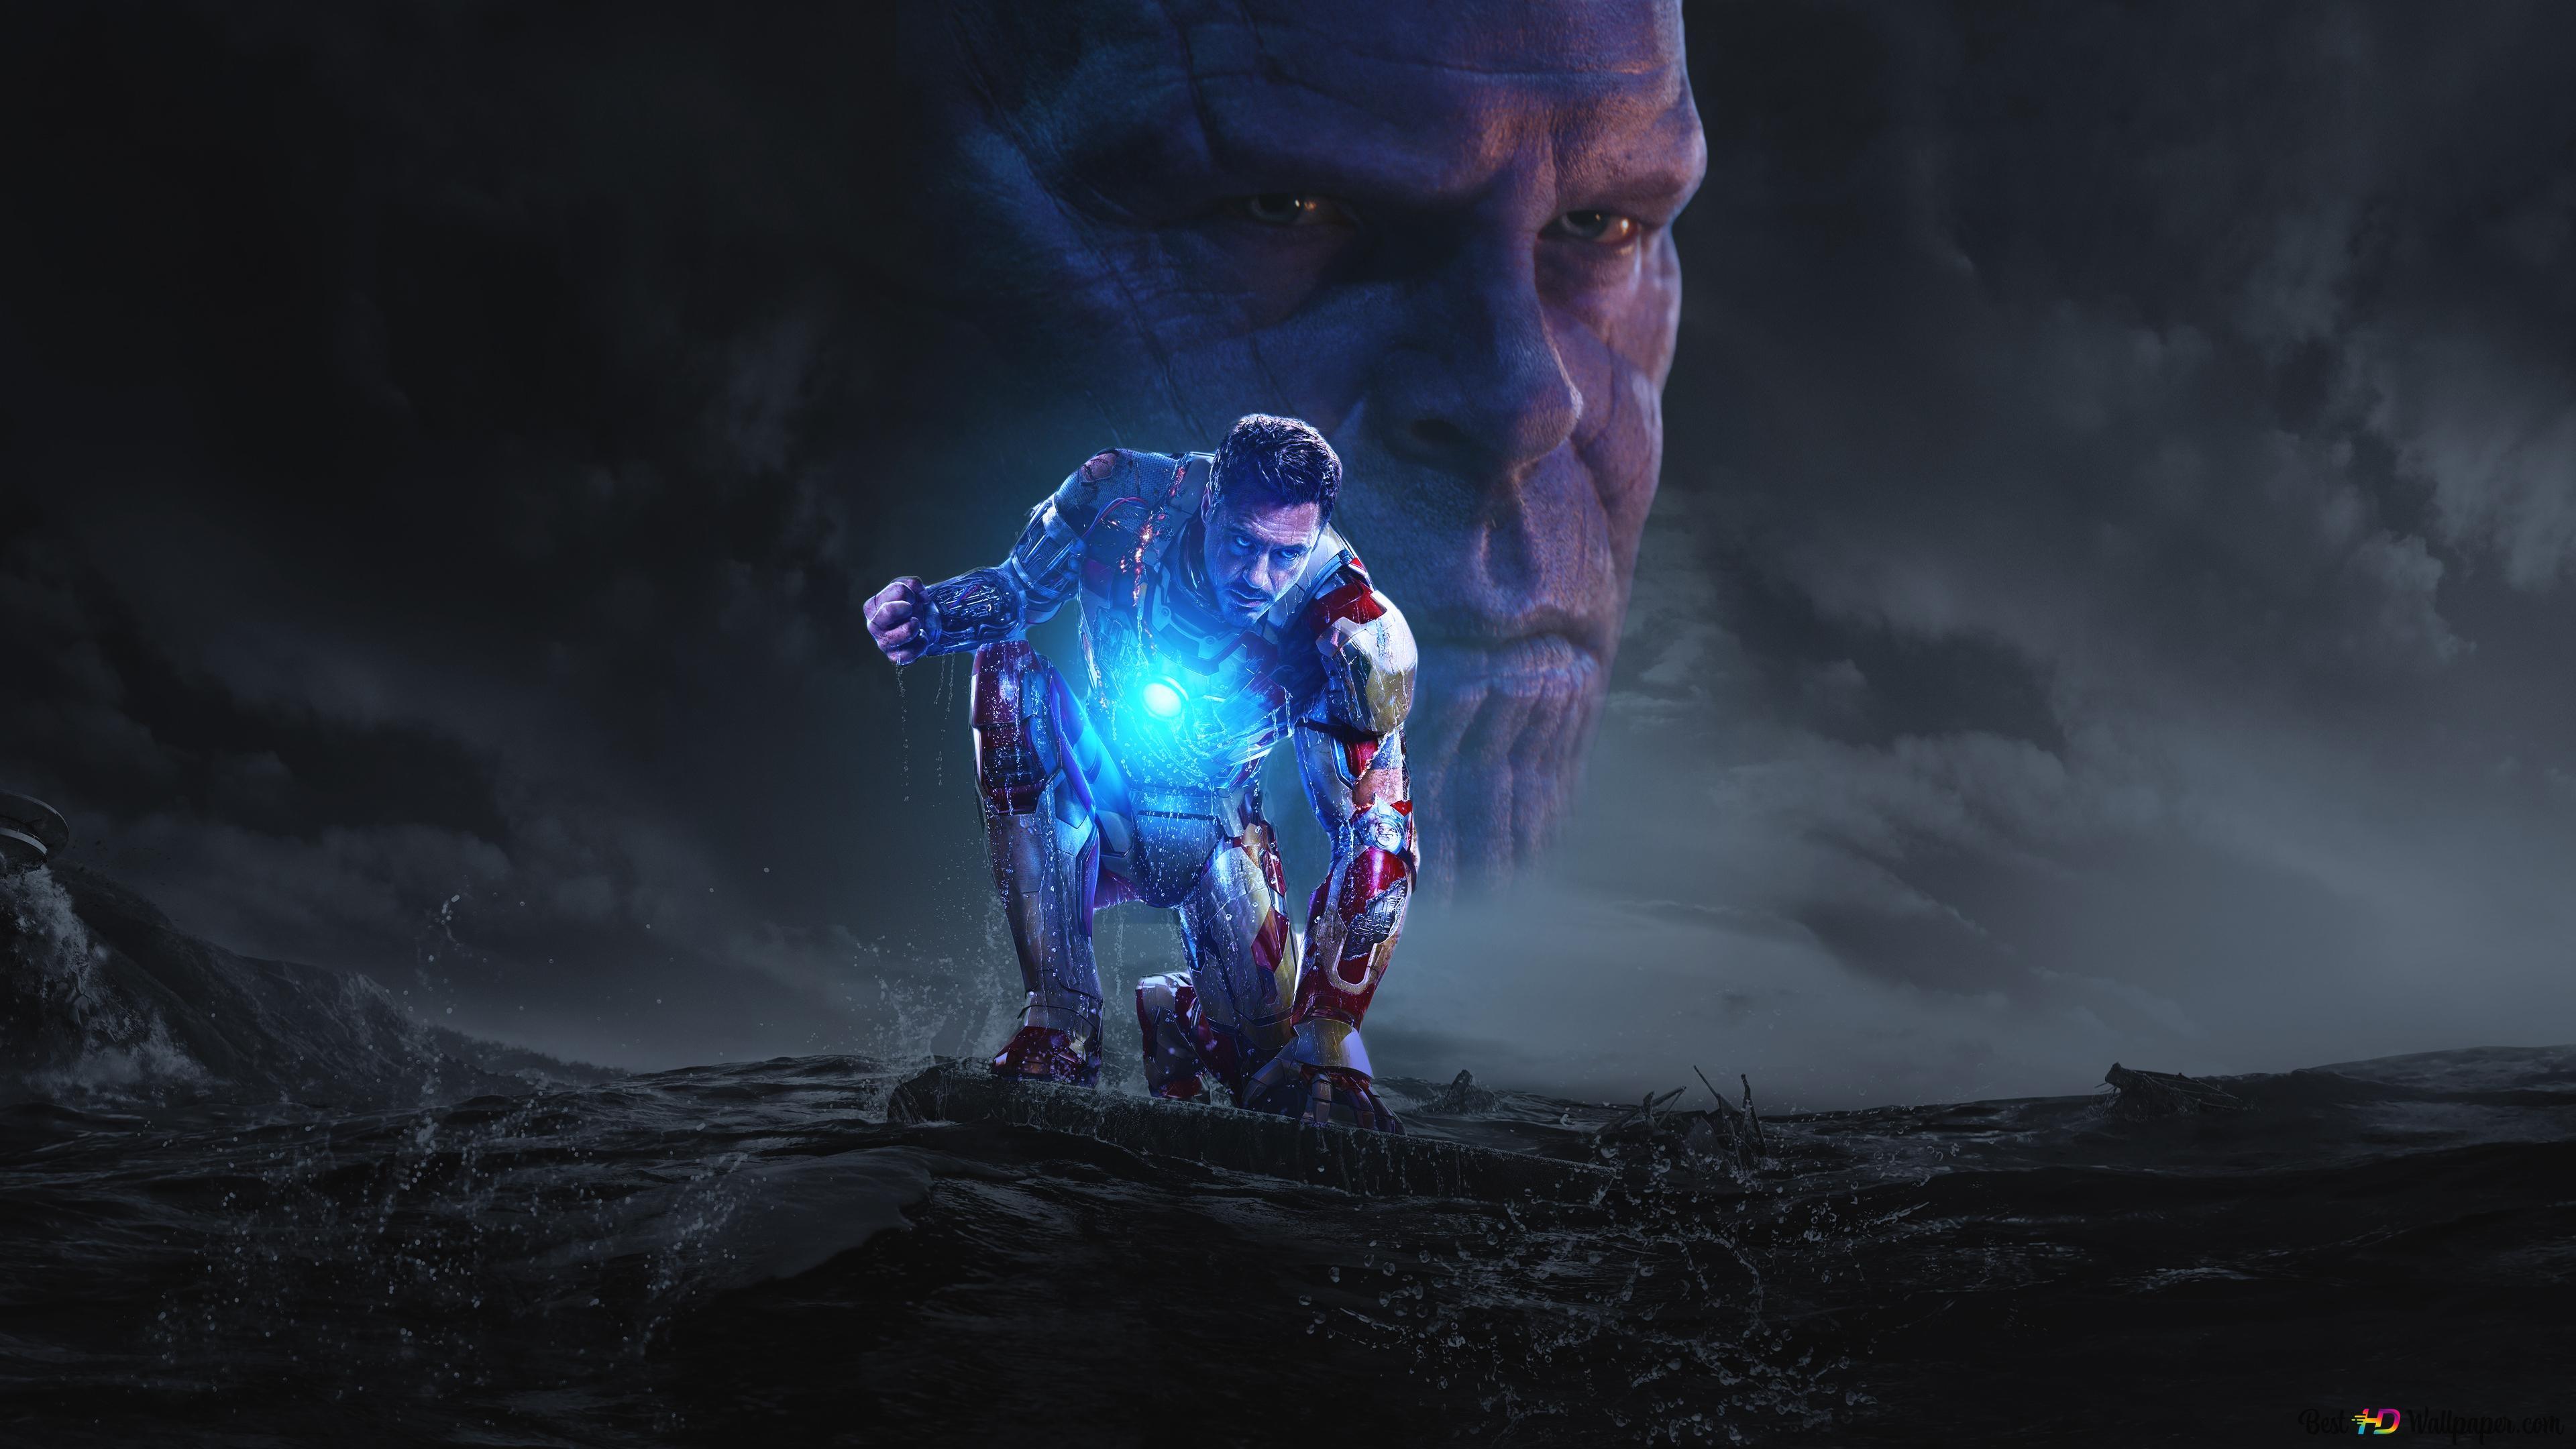 Iron Man 3 Thanos And Tony Stark Hd Wallpaper Download